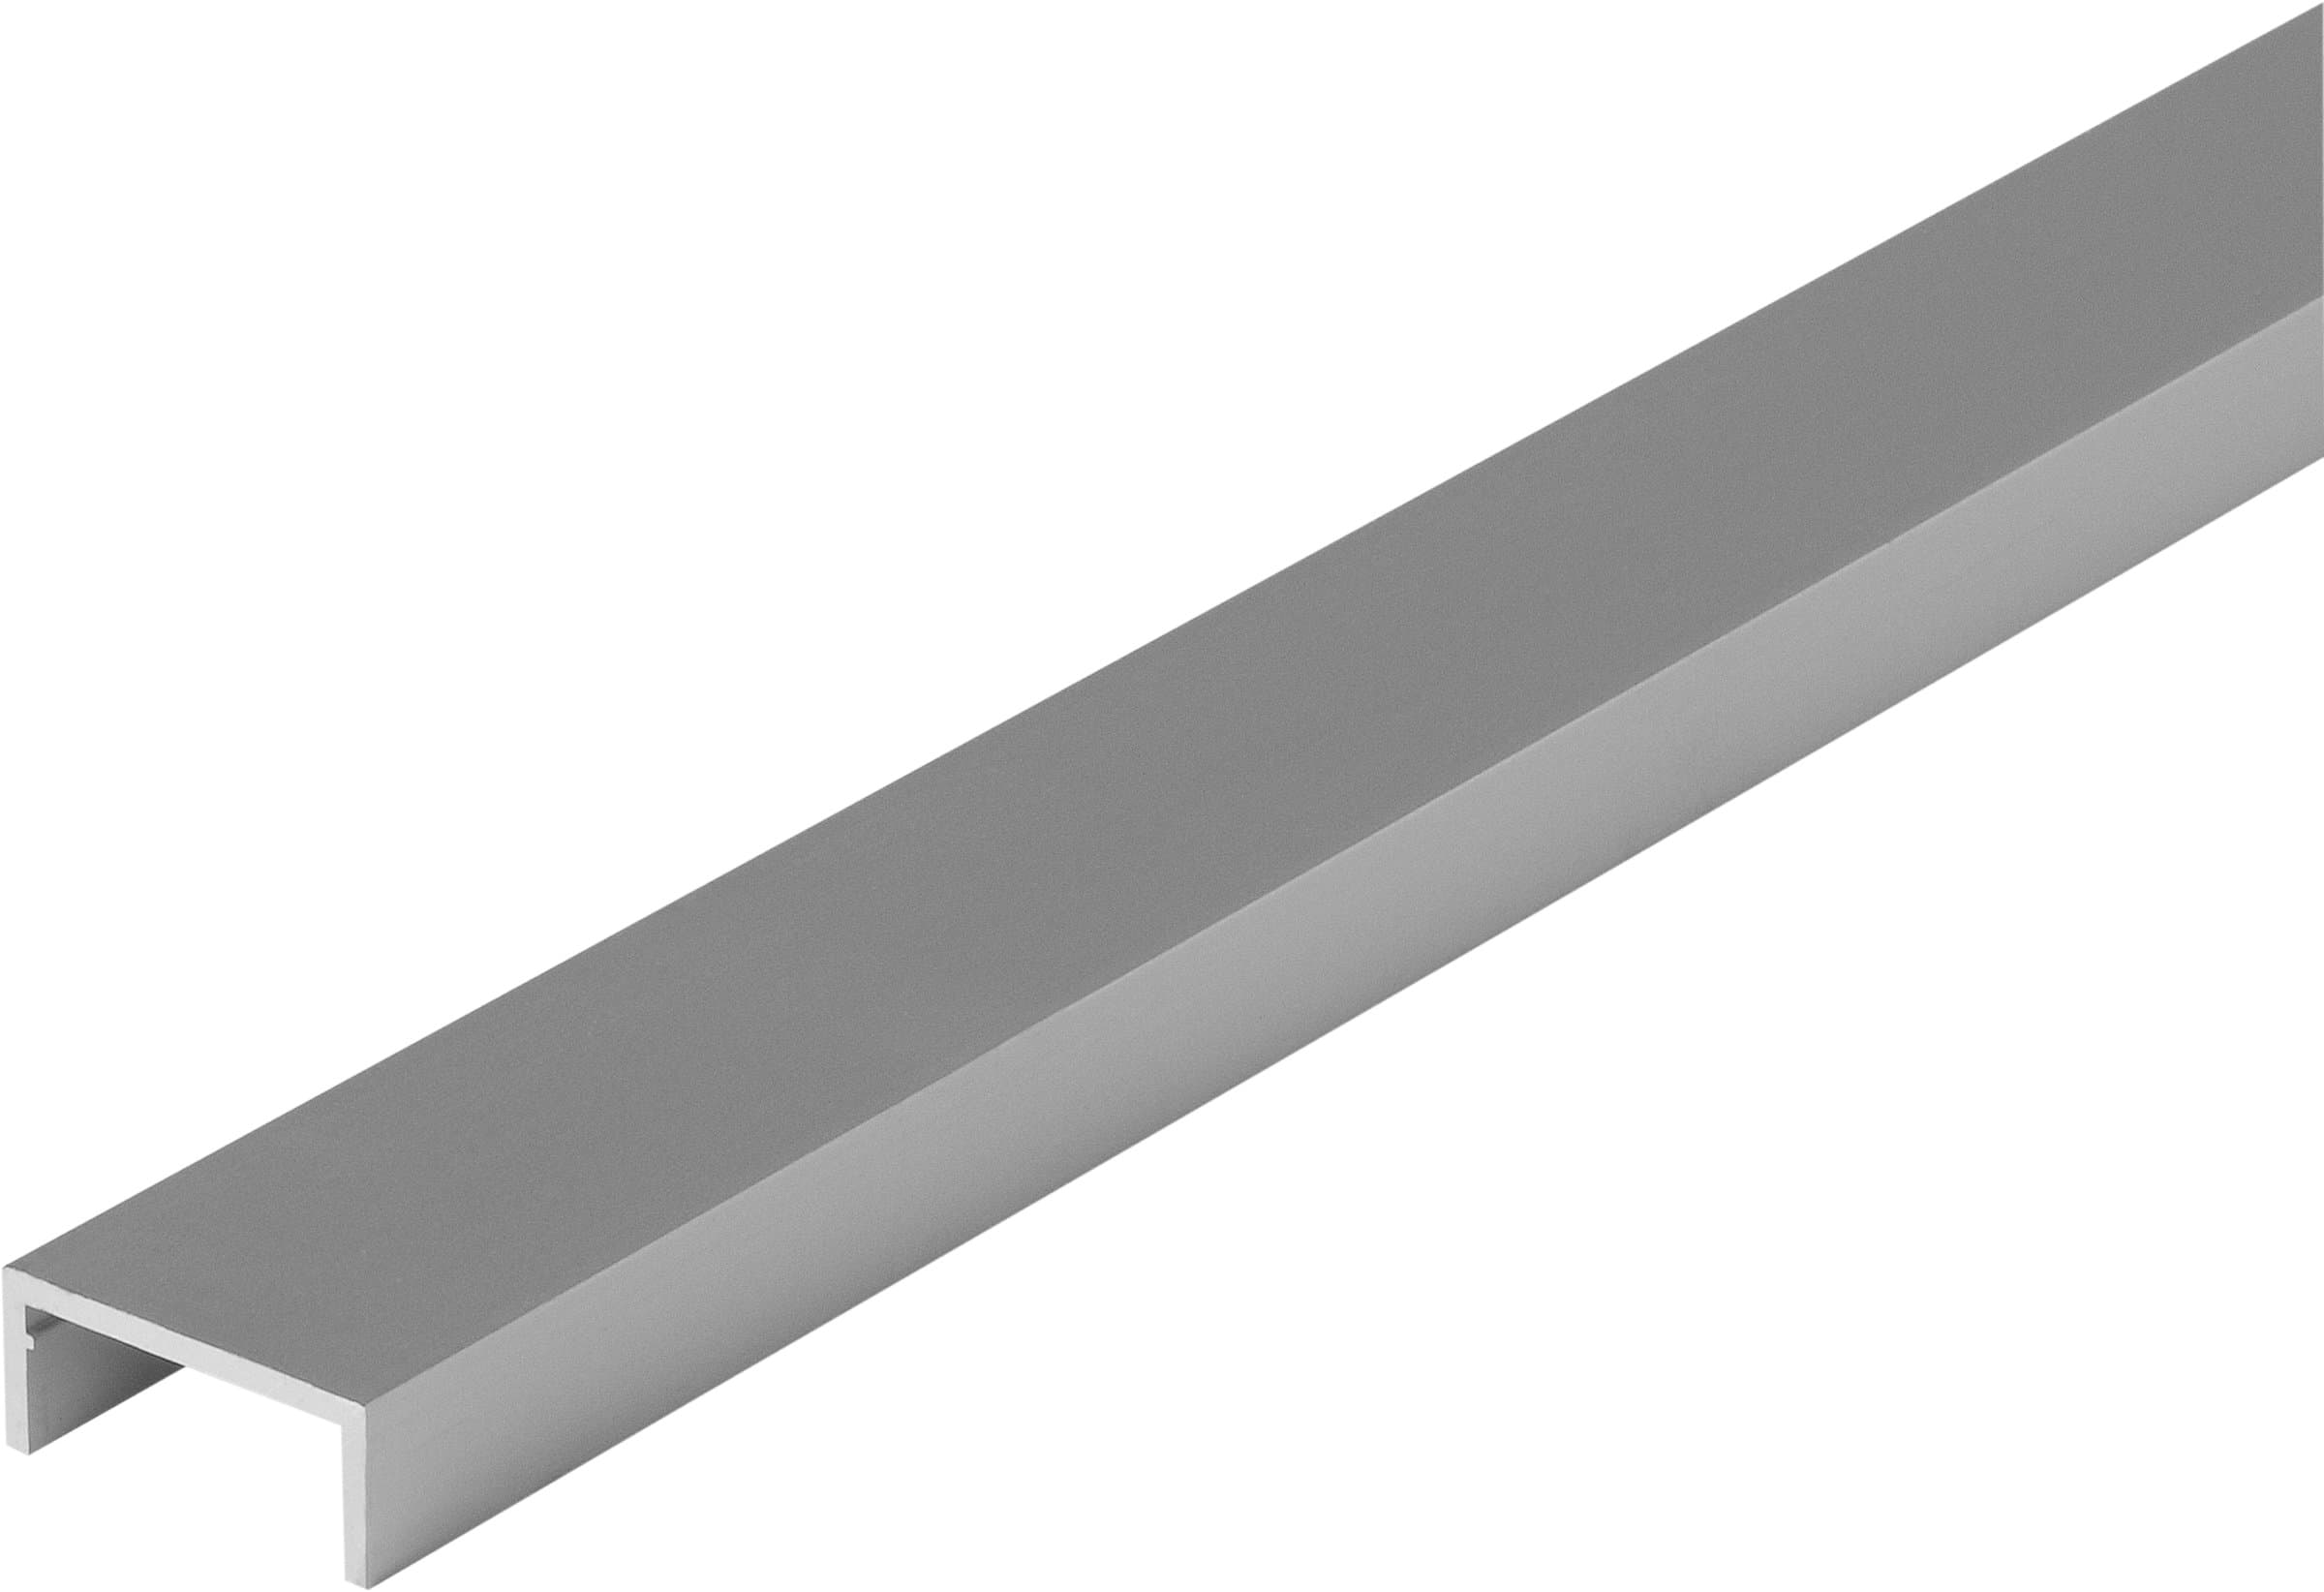 alfer U-Profilé 1.5 x 10 x 22.5 mm argent 1 m